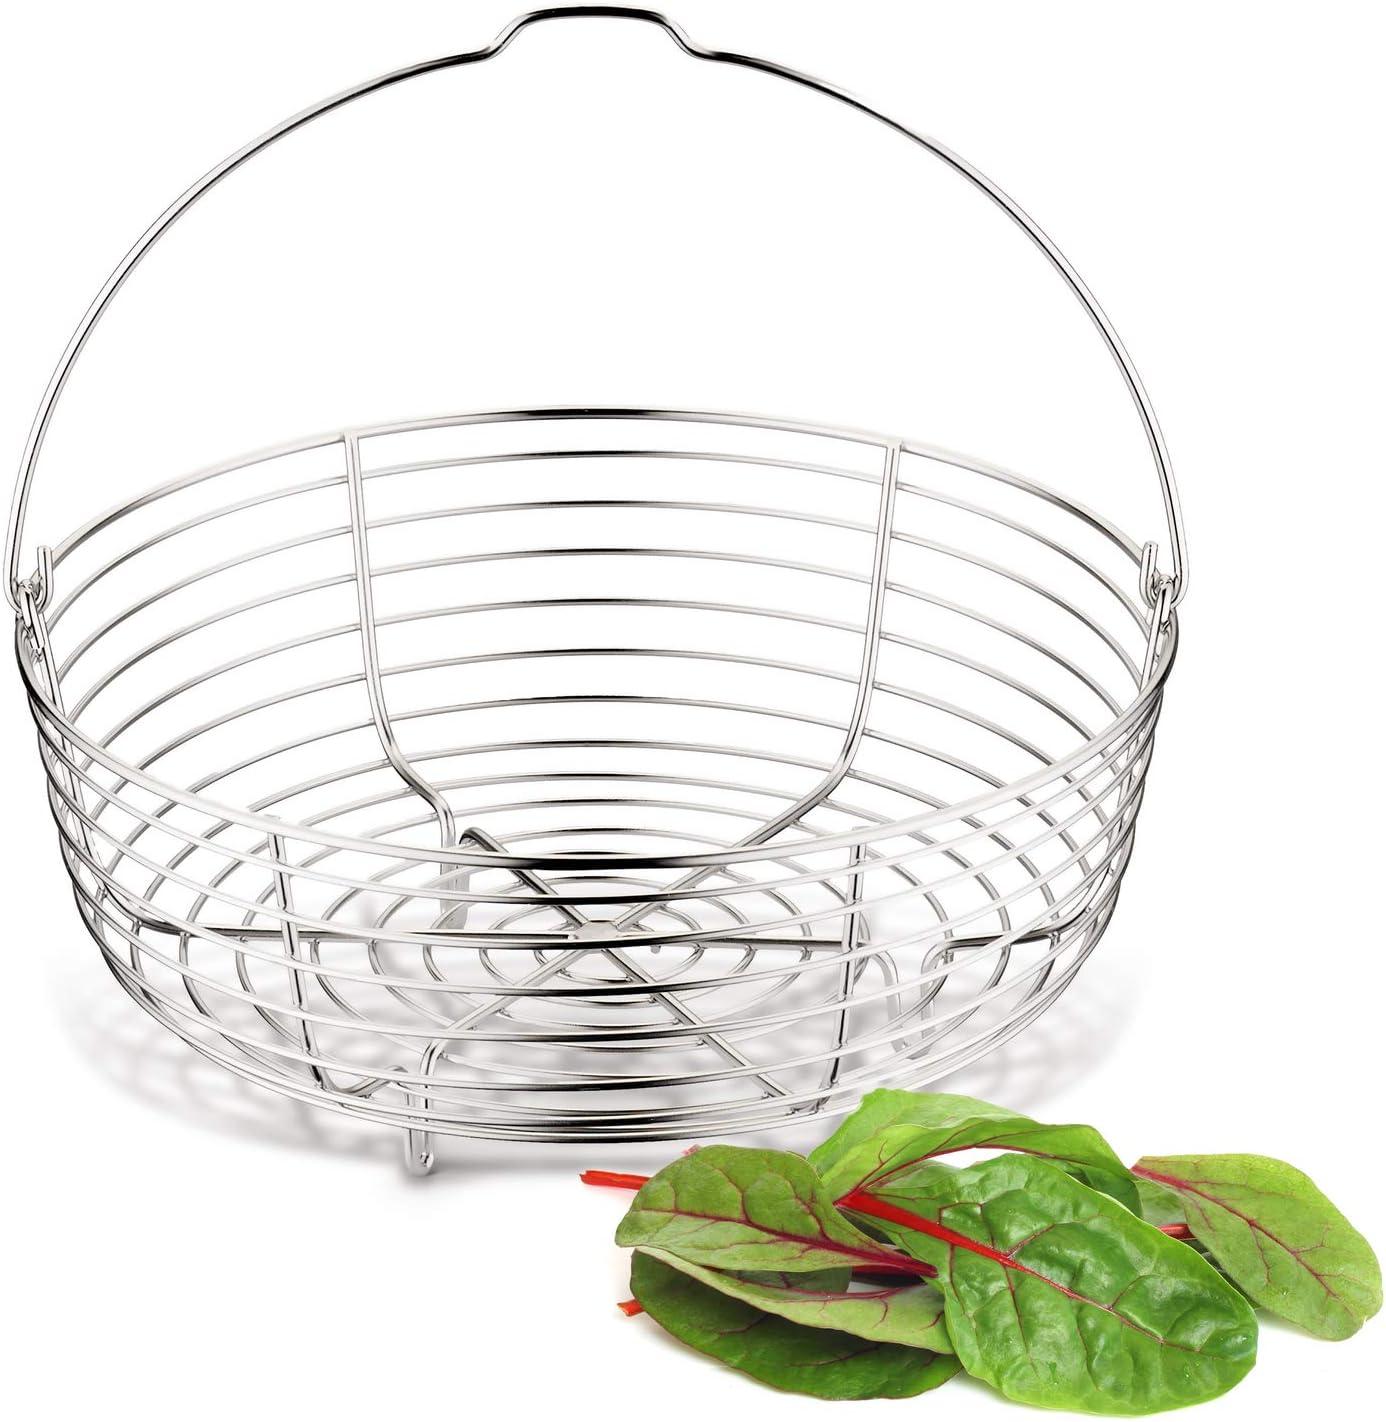 Lagostina 010920260107 1basket(s) Stainless Steel steam Cooker - steam cookers (1 Basket(s), Stainless Steel, 7 L)